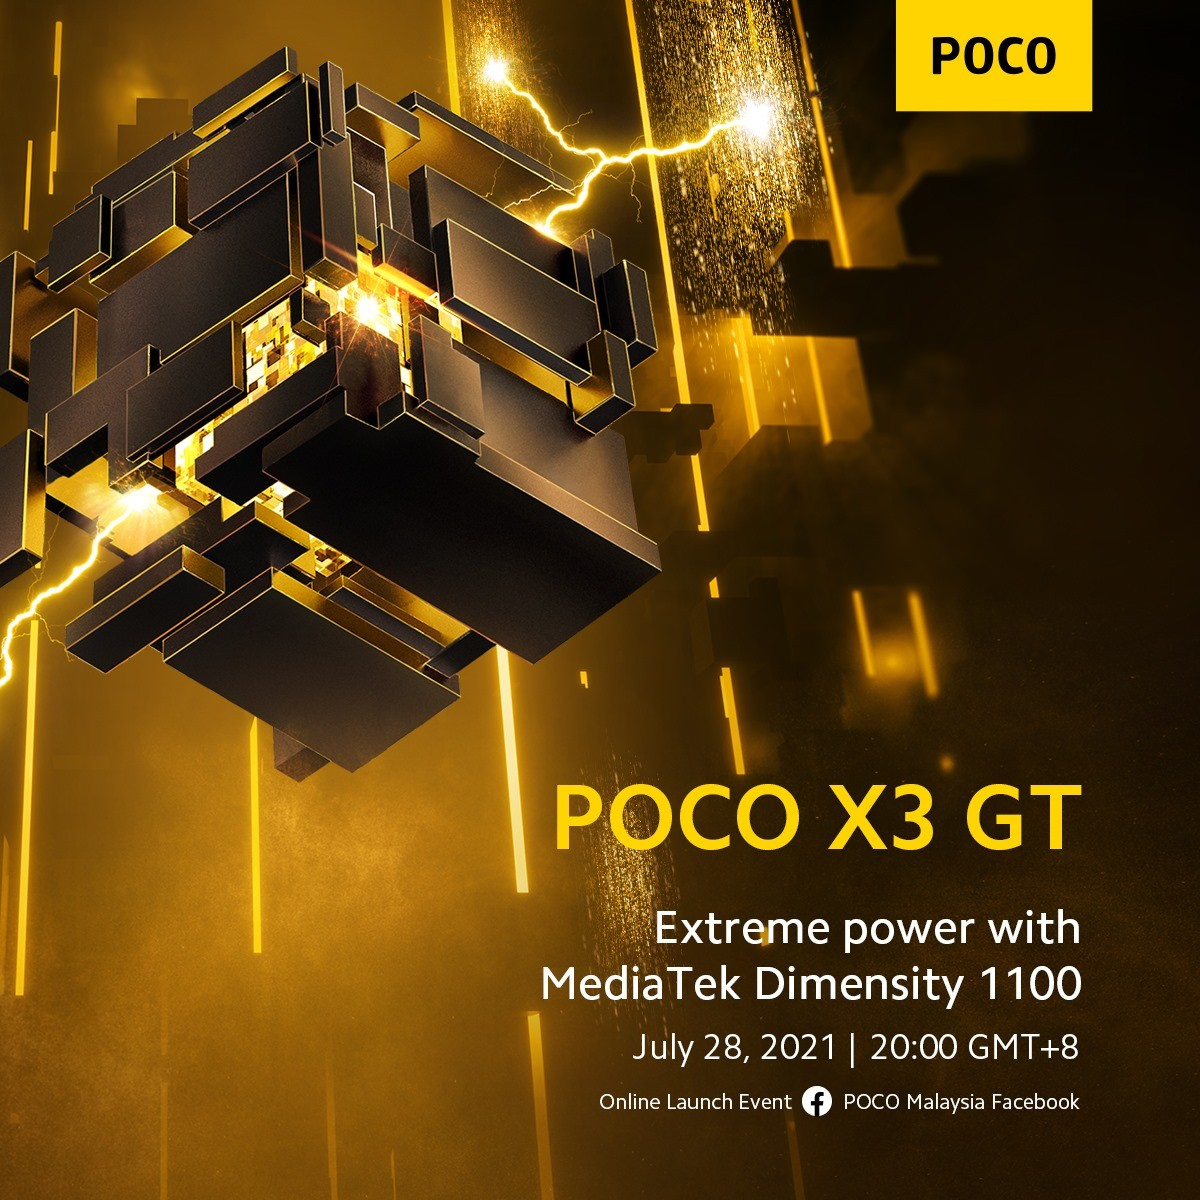 Poco X3 GT's design confirmed through renders, Dimensity 1100 also verified